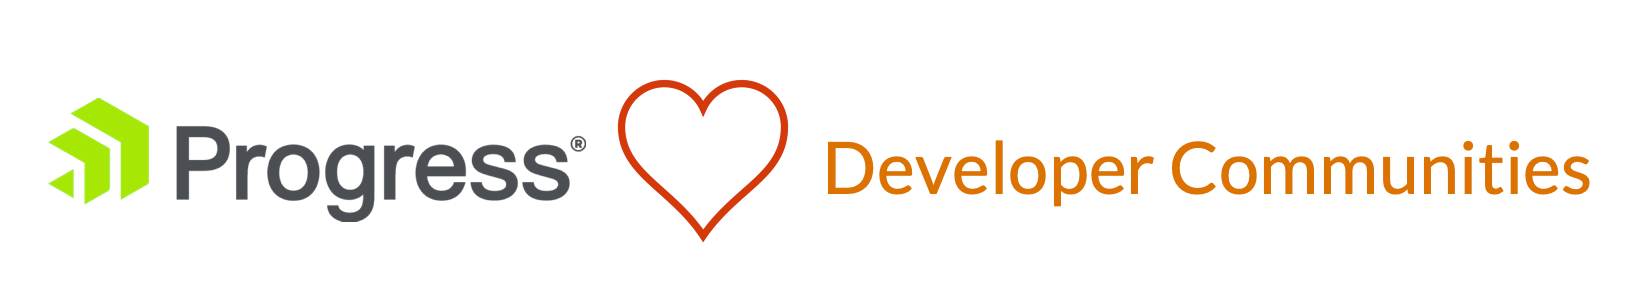 Announcing the Progress Developer Community Support Program